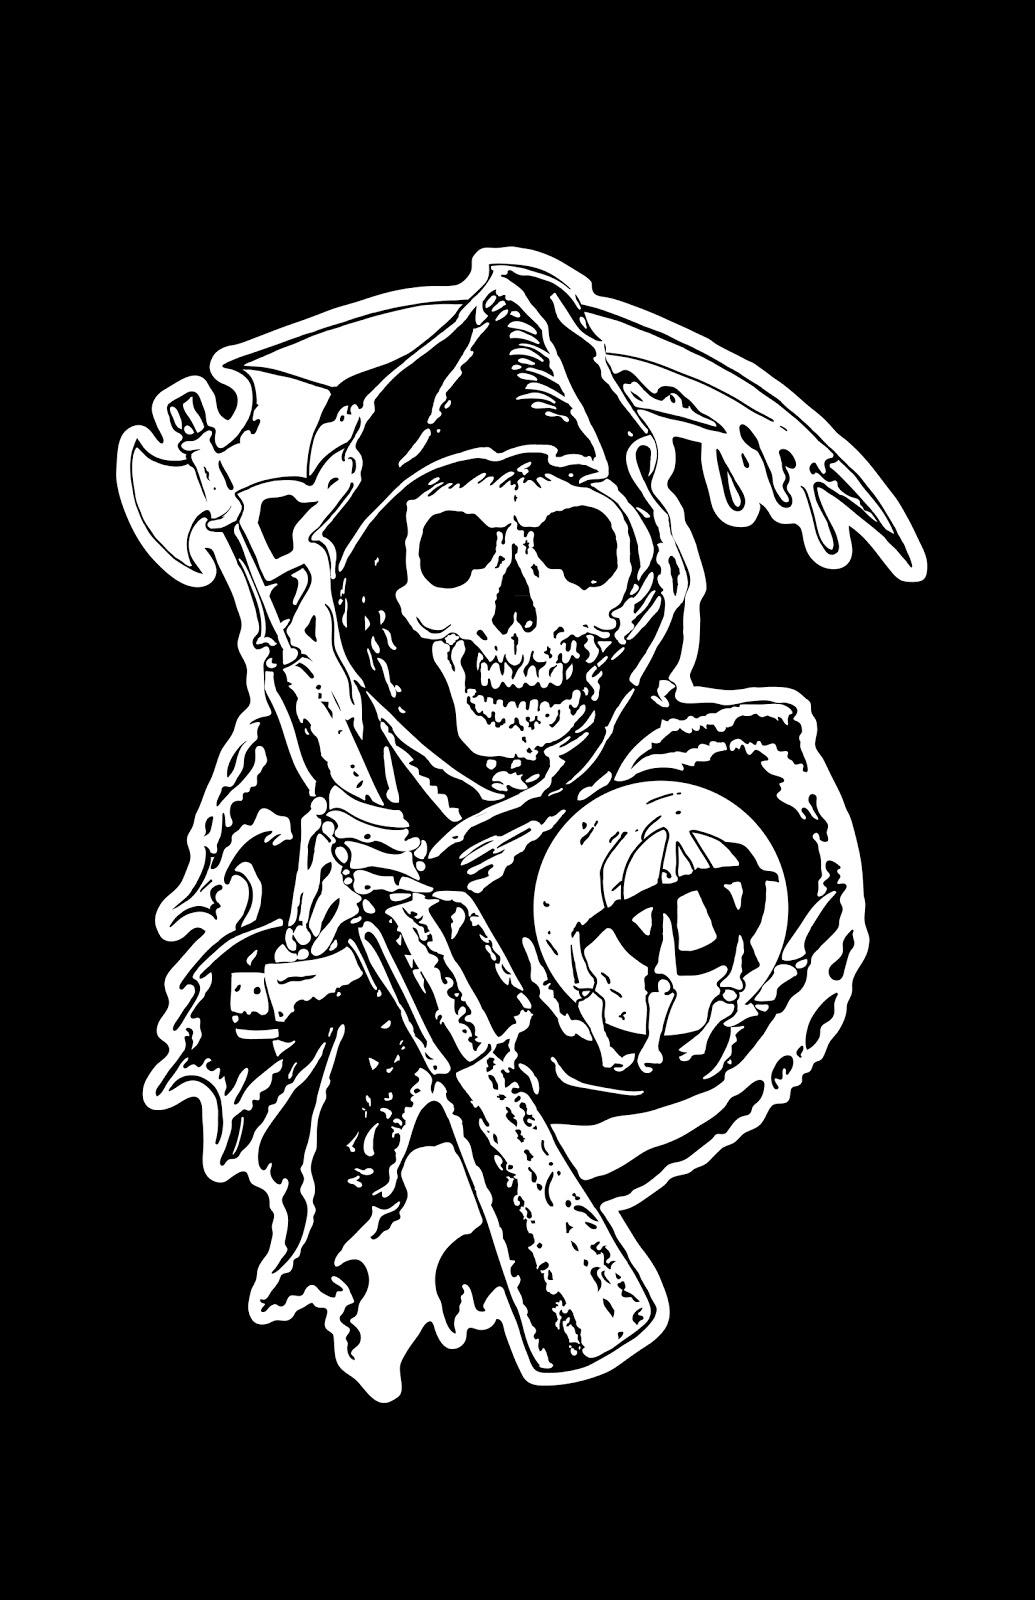 Gemeinsame Sons of Anarchy | Elaborate Doodles @LU_35